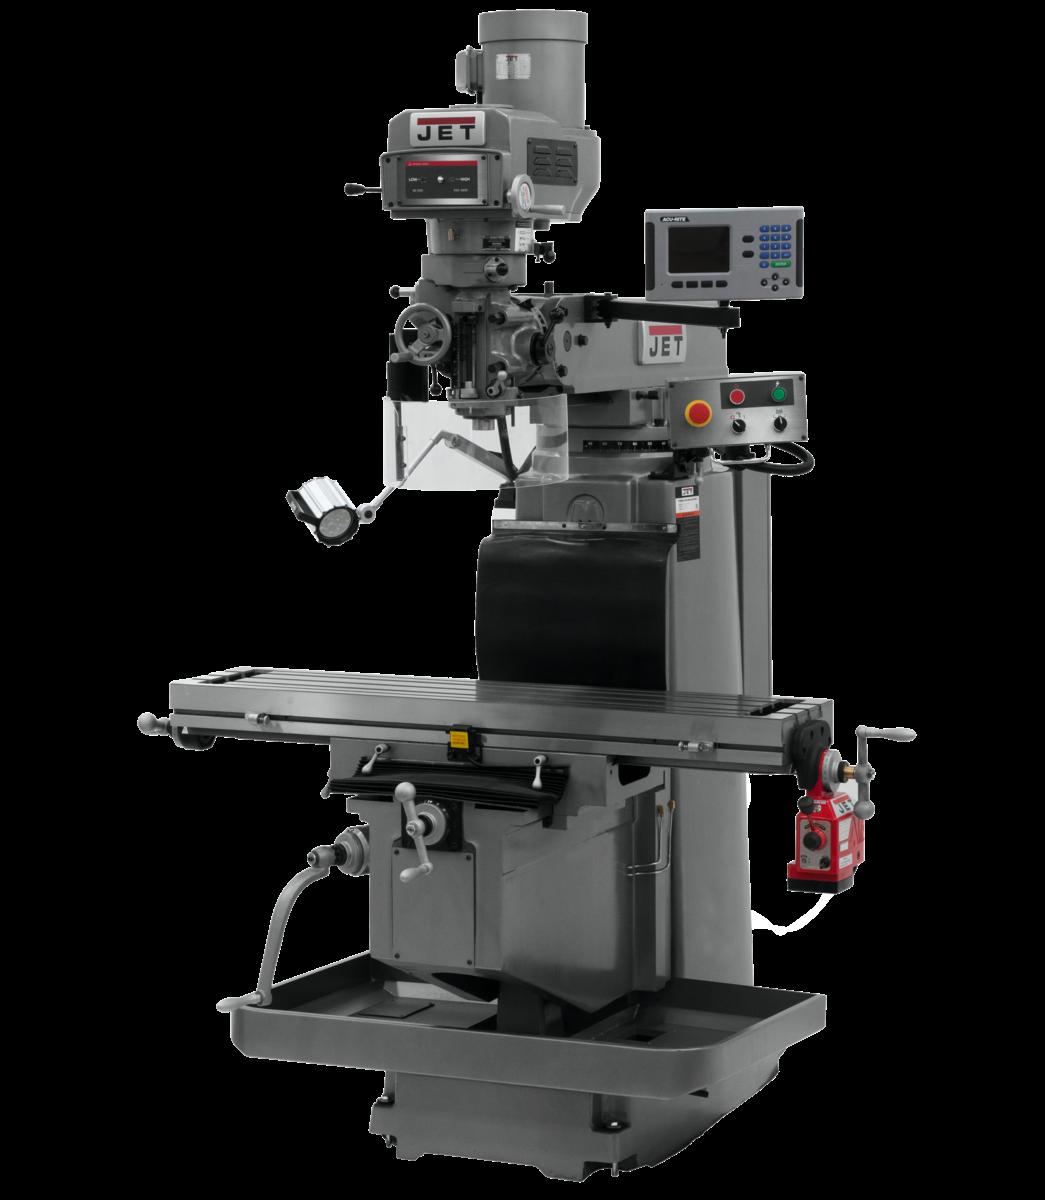 JTM-1254RVS with  ACU-RITE 203 3X (Q) DRO &  X Powerfeed